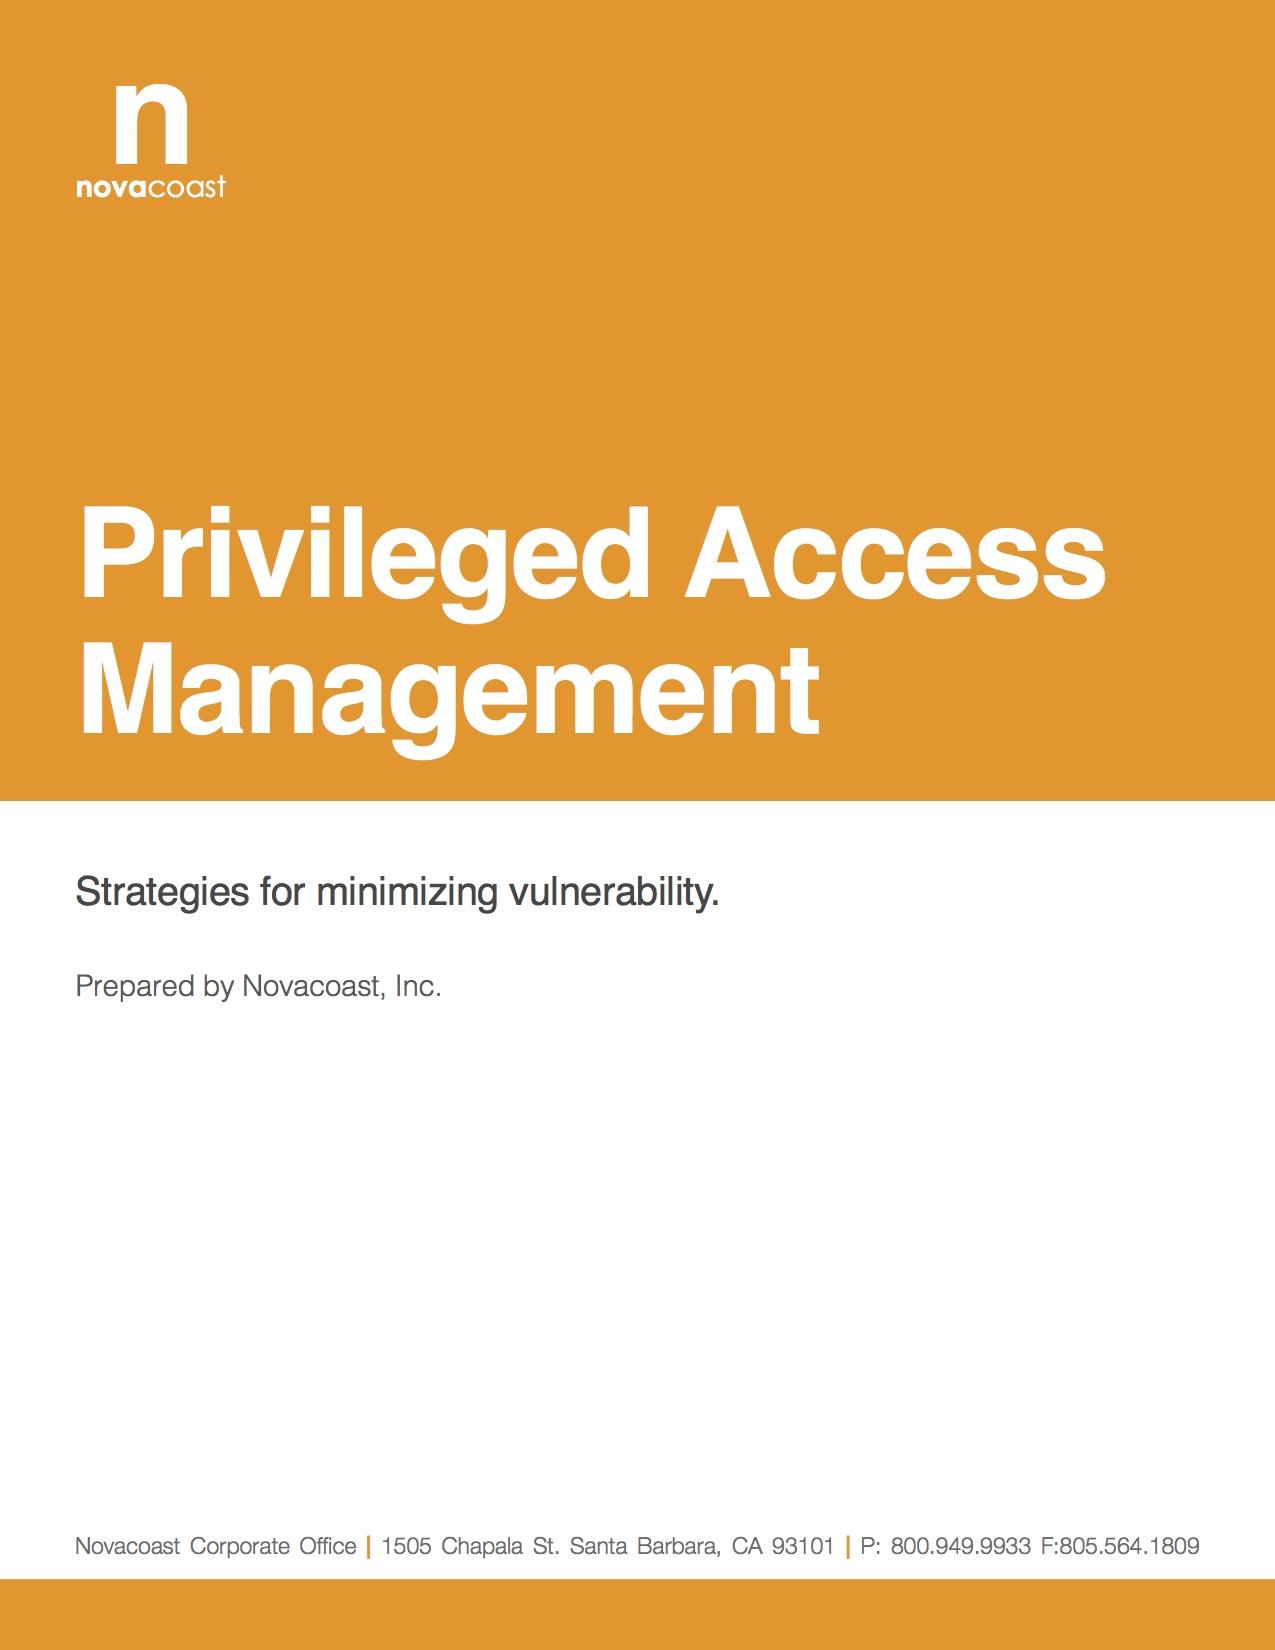 Privileged_Access_Whitepaper